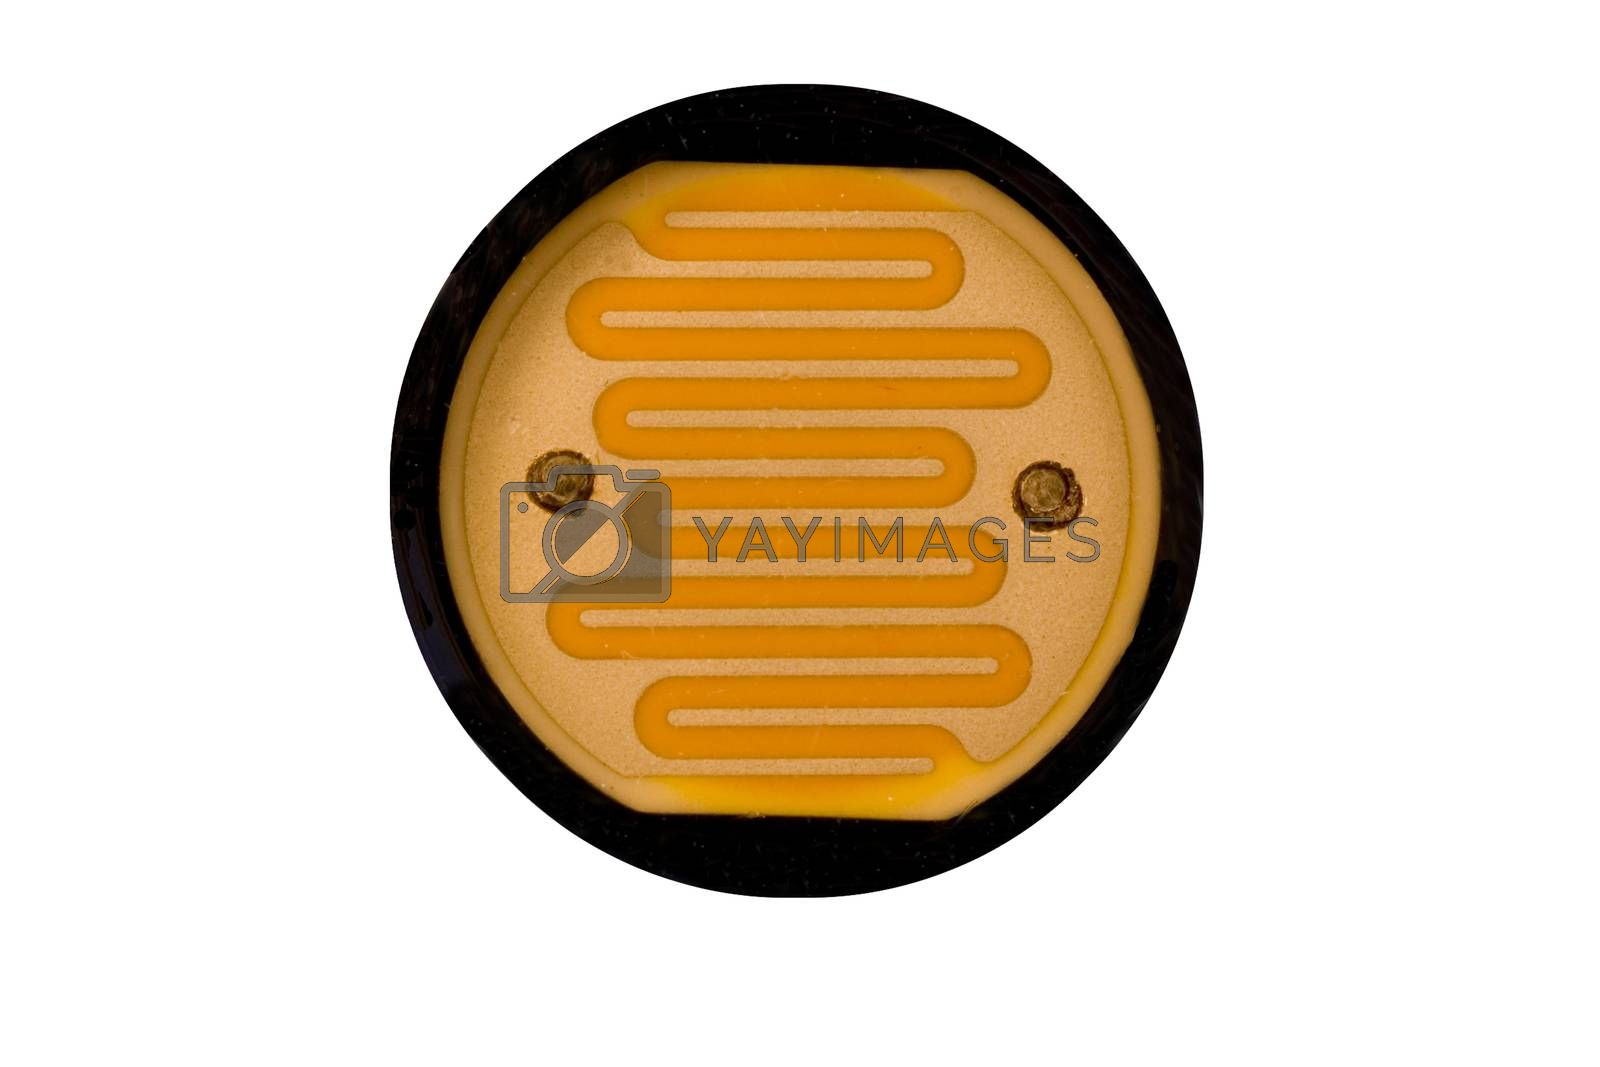 A close up of a Light Dependent Resistor